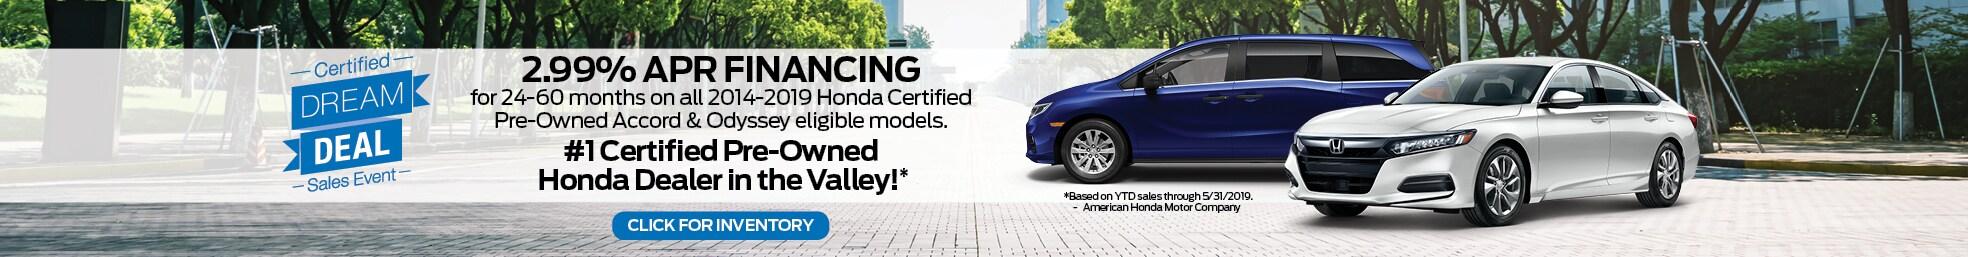 Honda Dealership Az >> Honda Service Sales New Used Cars Phoenix Az